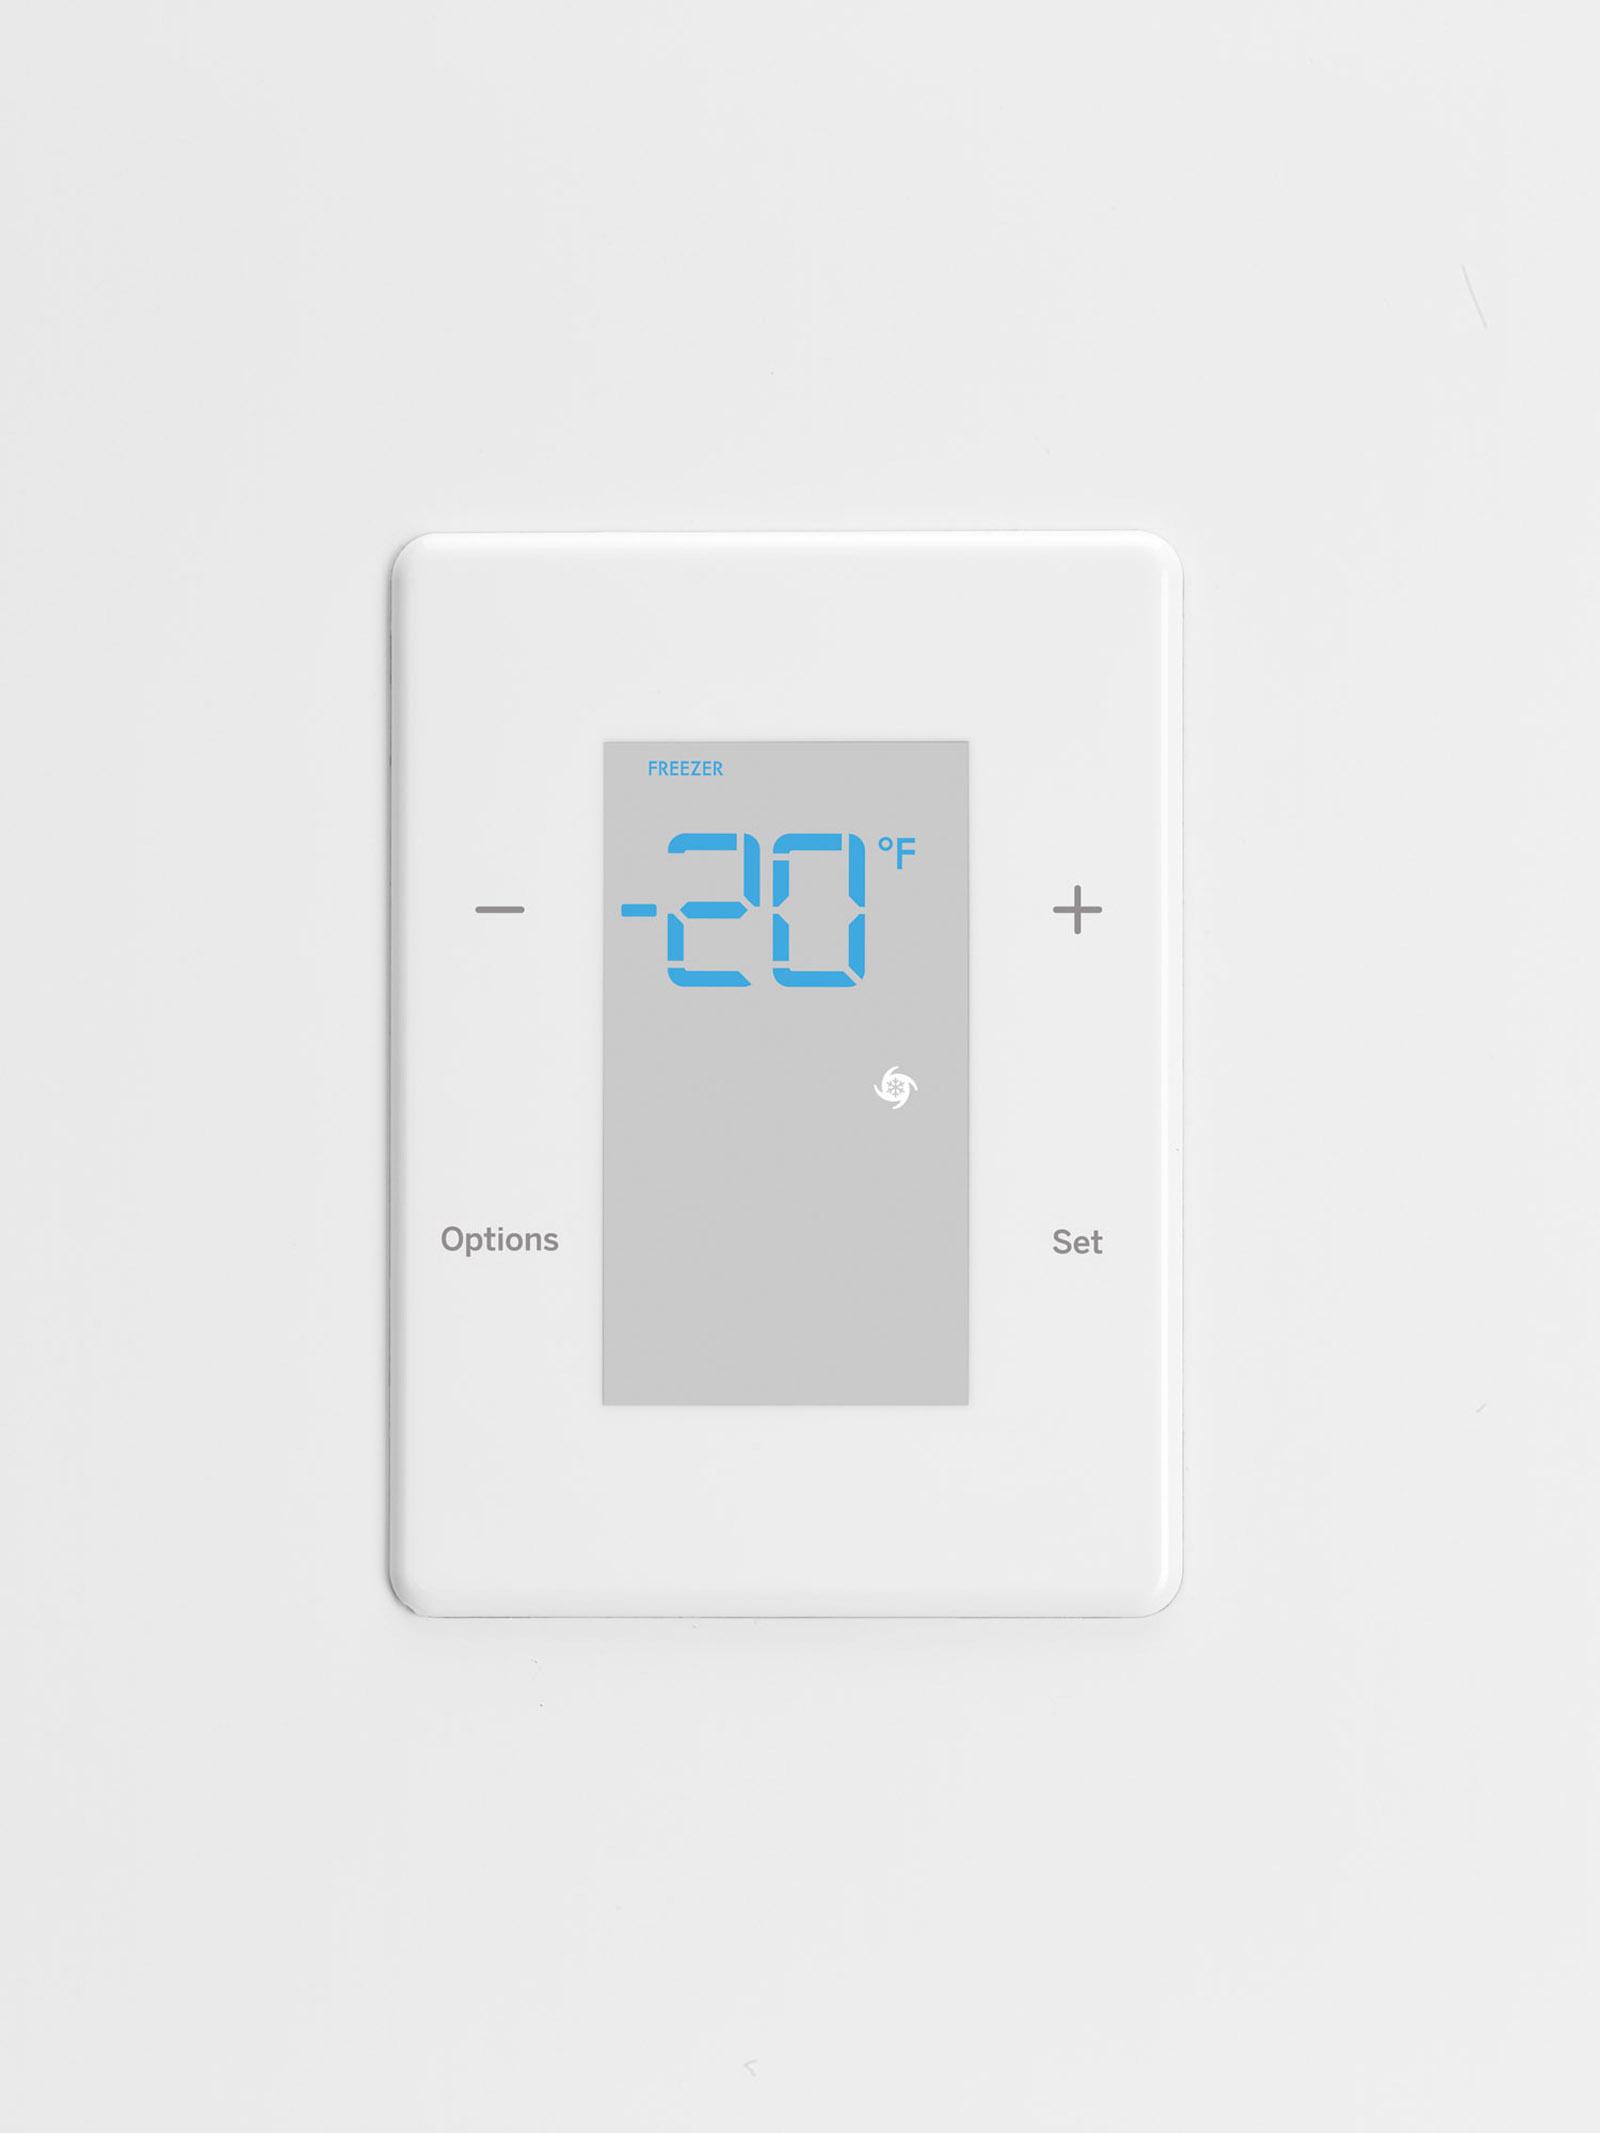 Kenmore Elite 27002 20.5 cu. ft. Upright Freezer - White